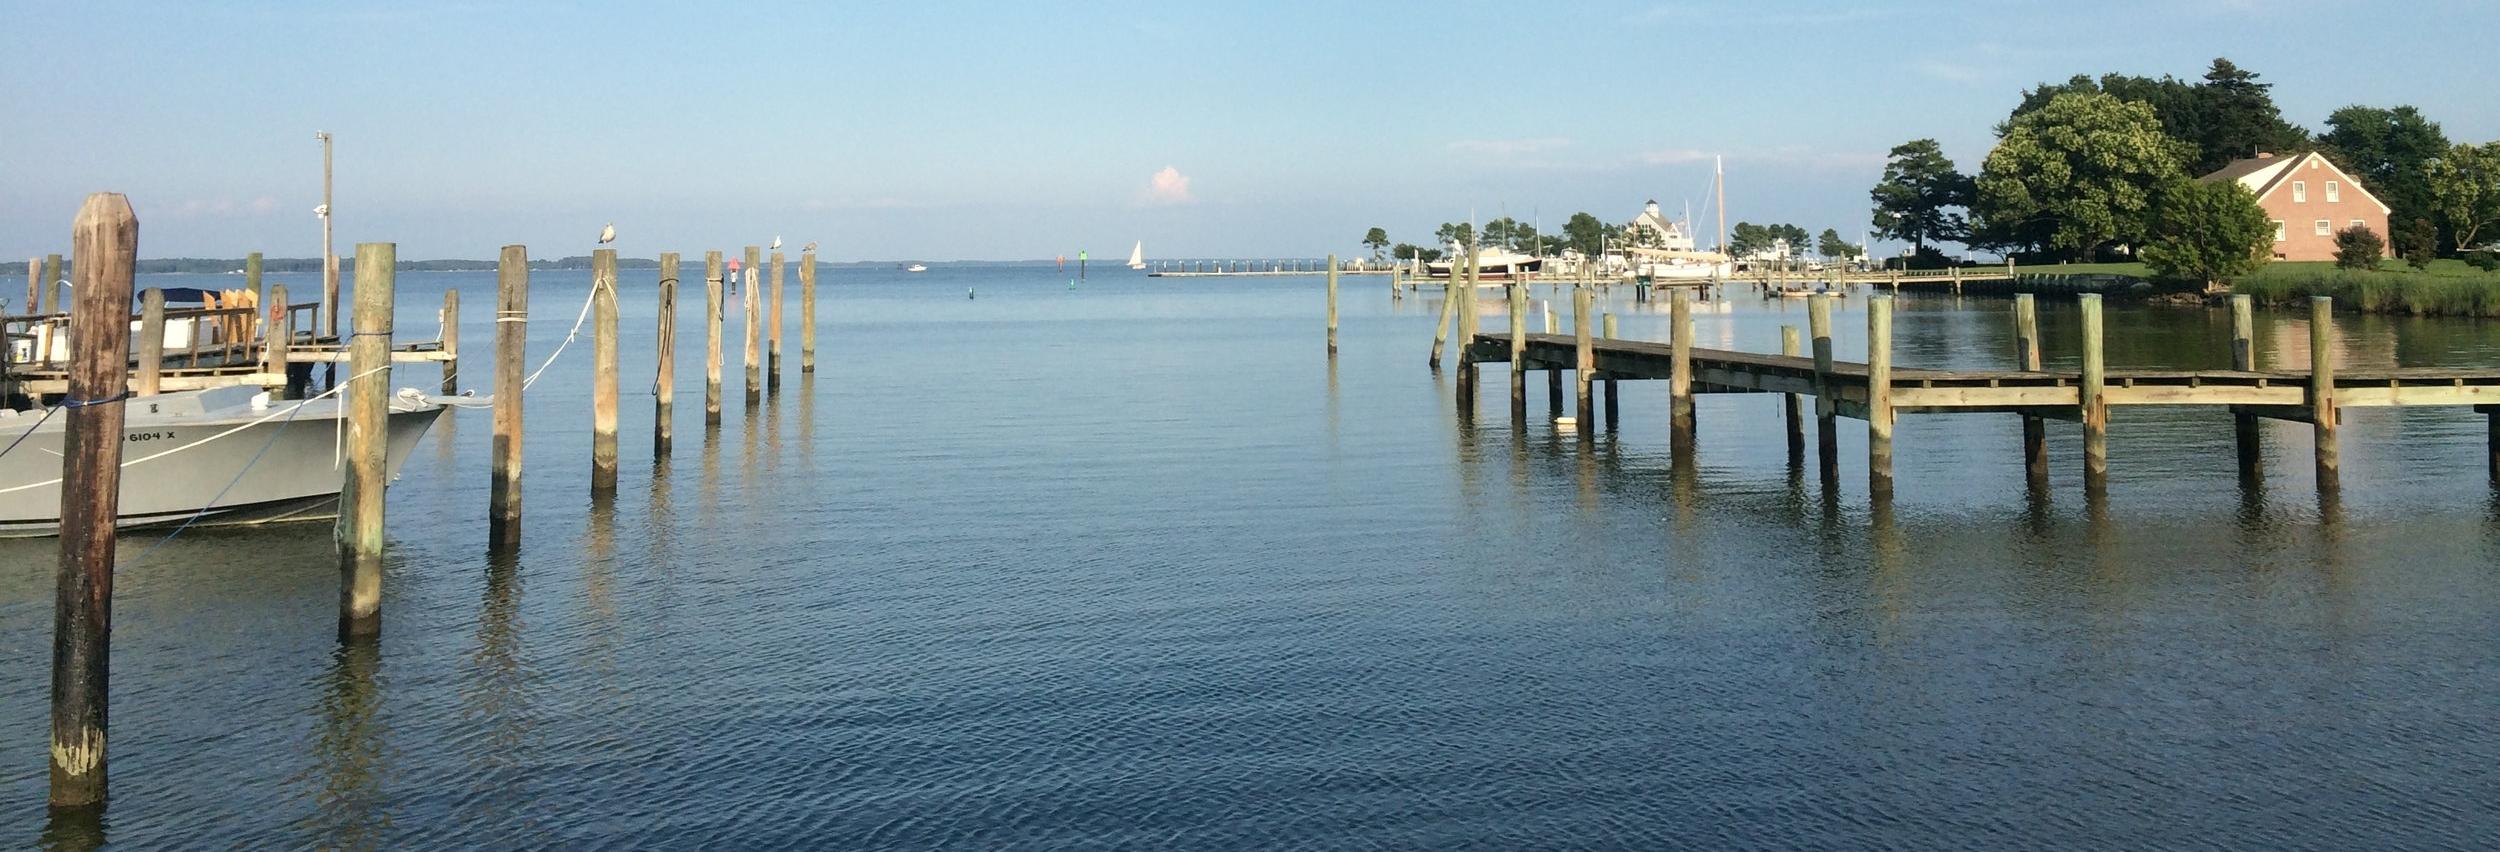 """Chesapeake Bay view from Maryland"""